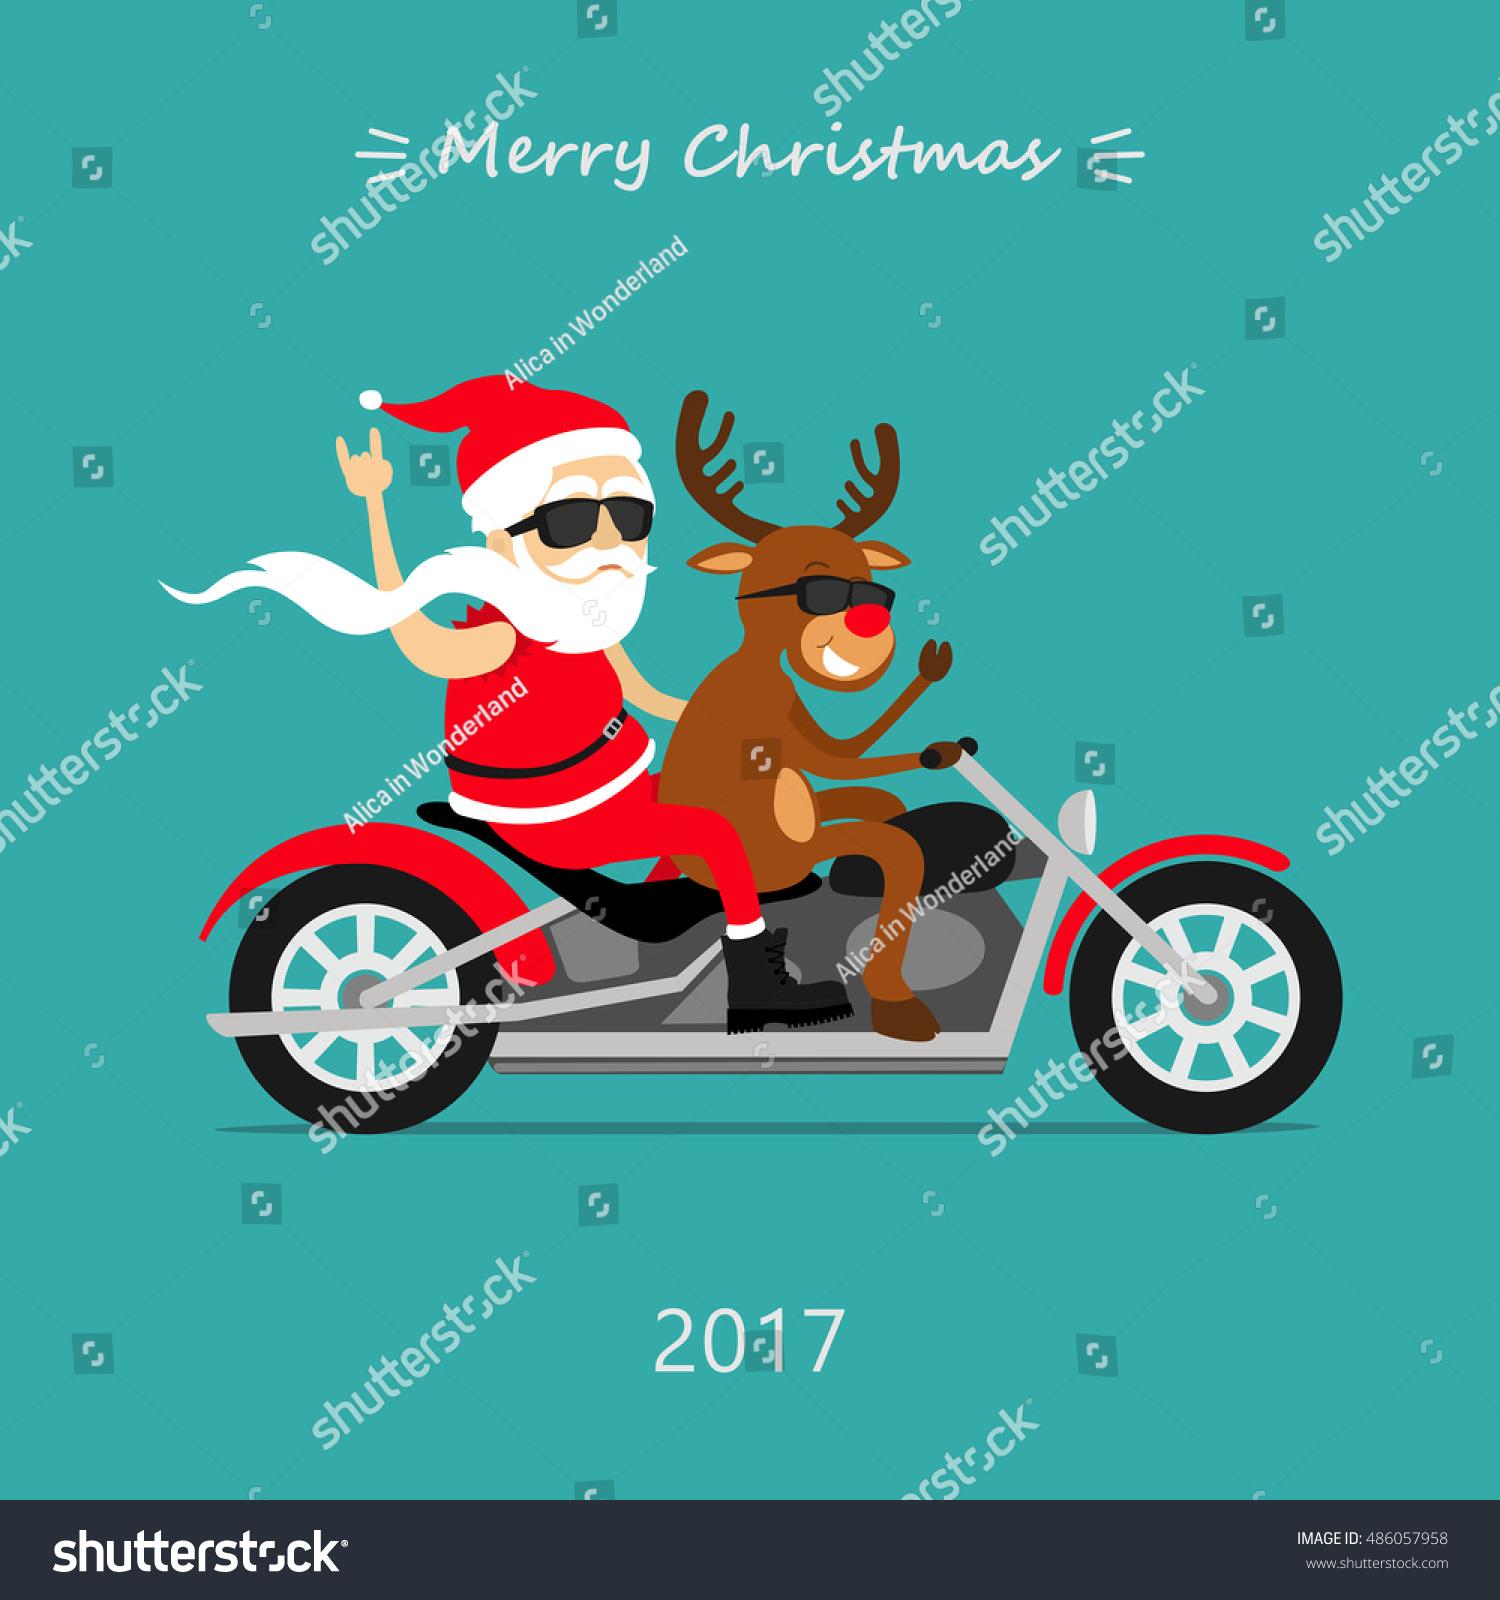 Merry Christmas Santa Claus Deer Ride Stock Vector (Royalty Free ...